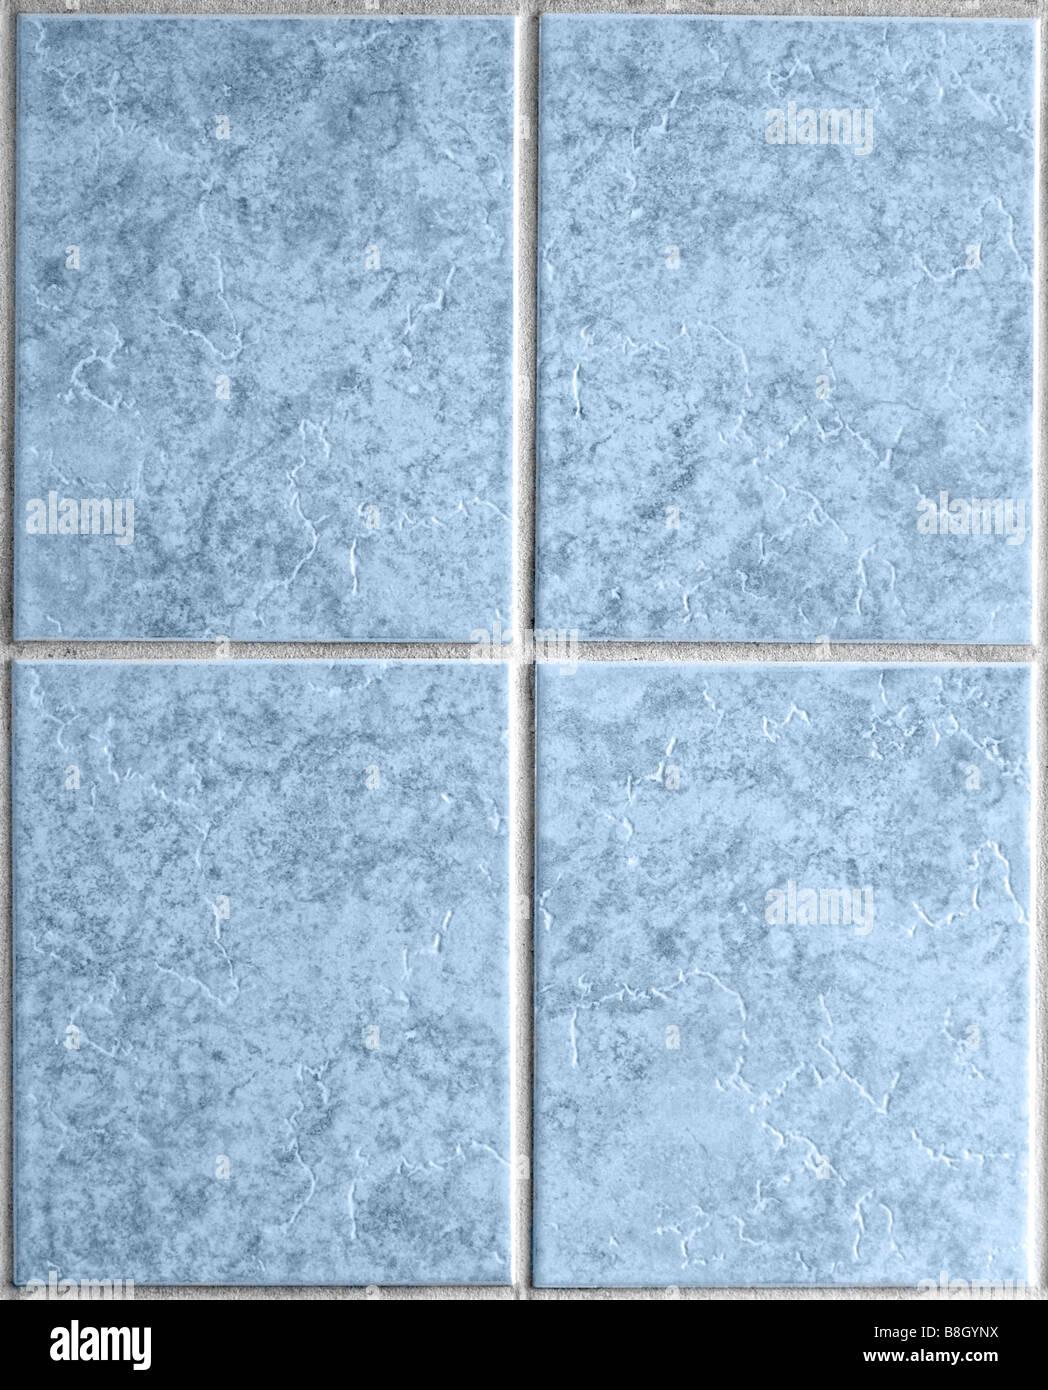 Blue Ceramic Tile Interior Stock Photos & Blue Ceramic Tile Interior ...